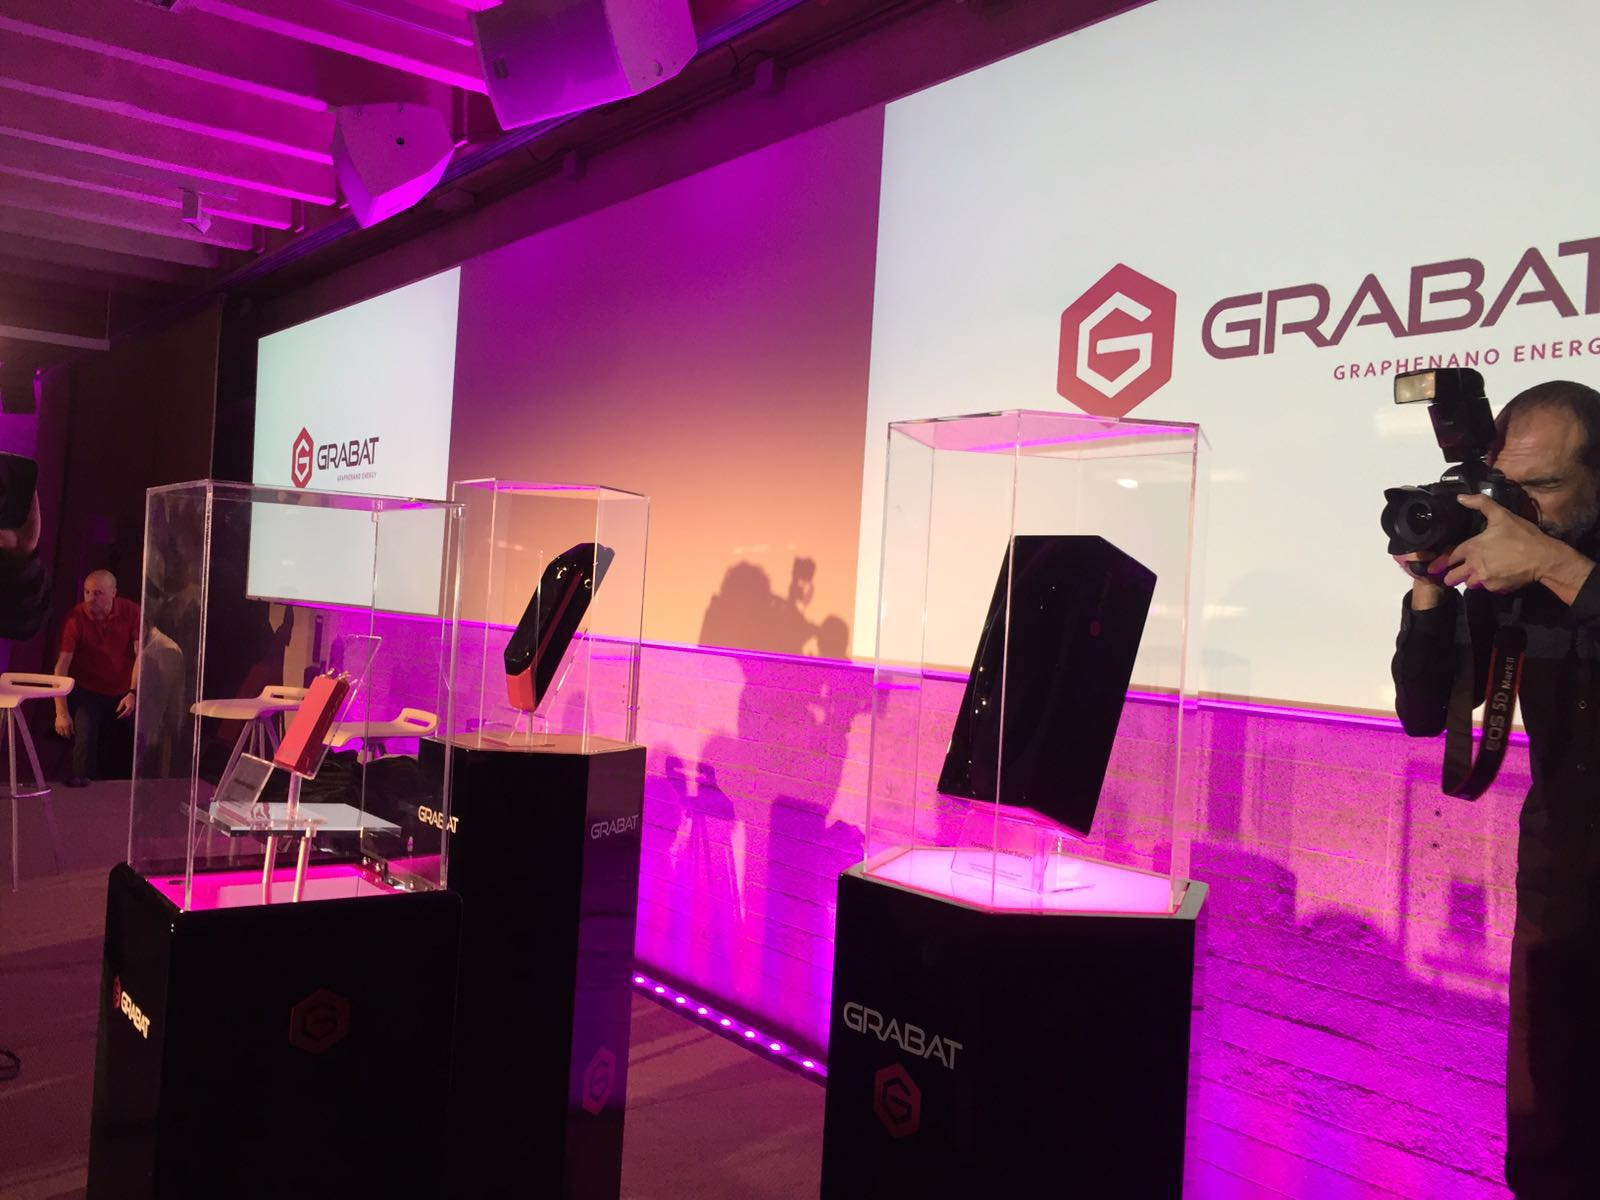 Графеновые батареи: производство запущено | Блог Болт | КОНТ